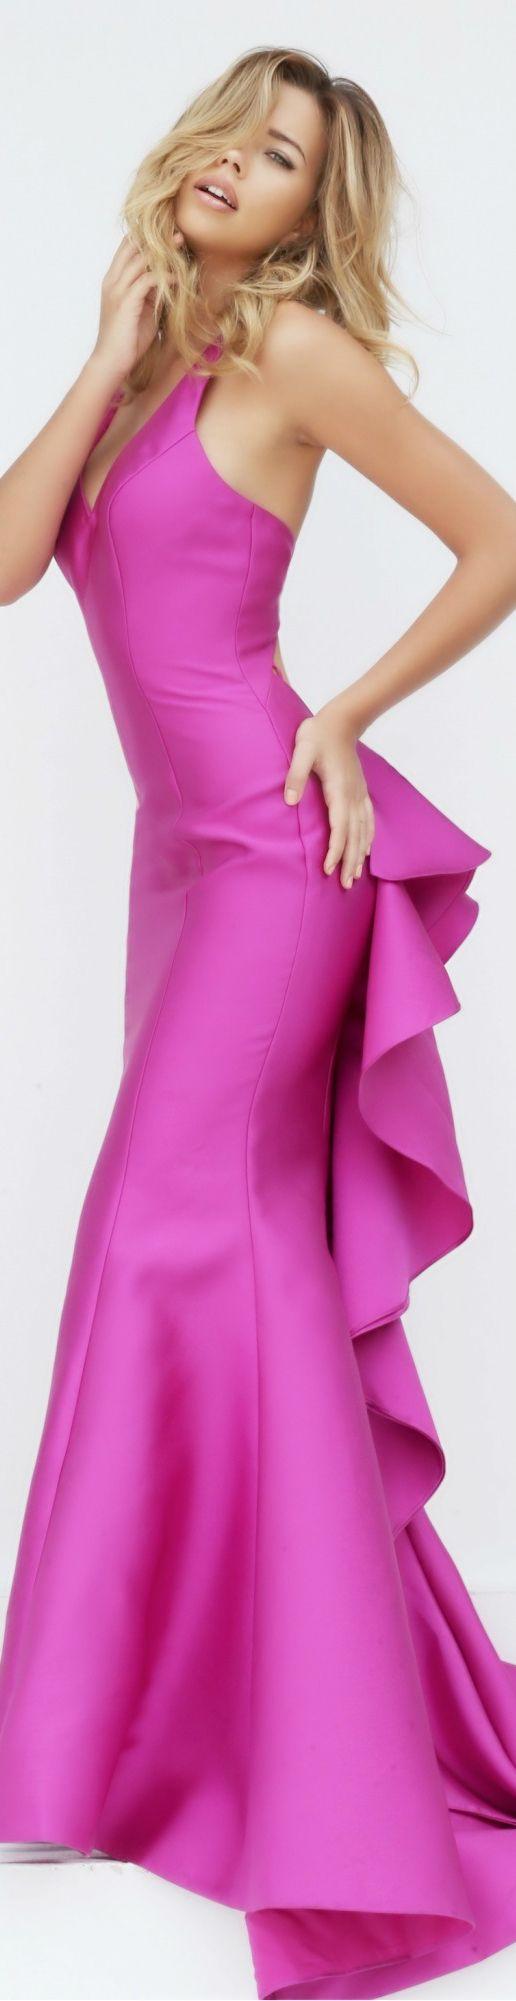 496 best Everything Pink images on Pinterest | Hot pink, Pink sugar ...